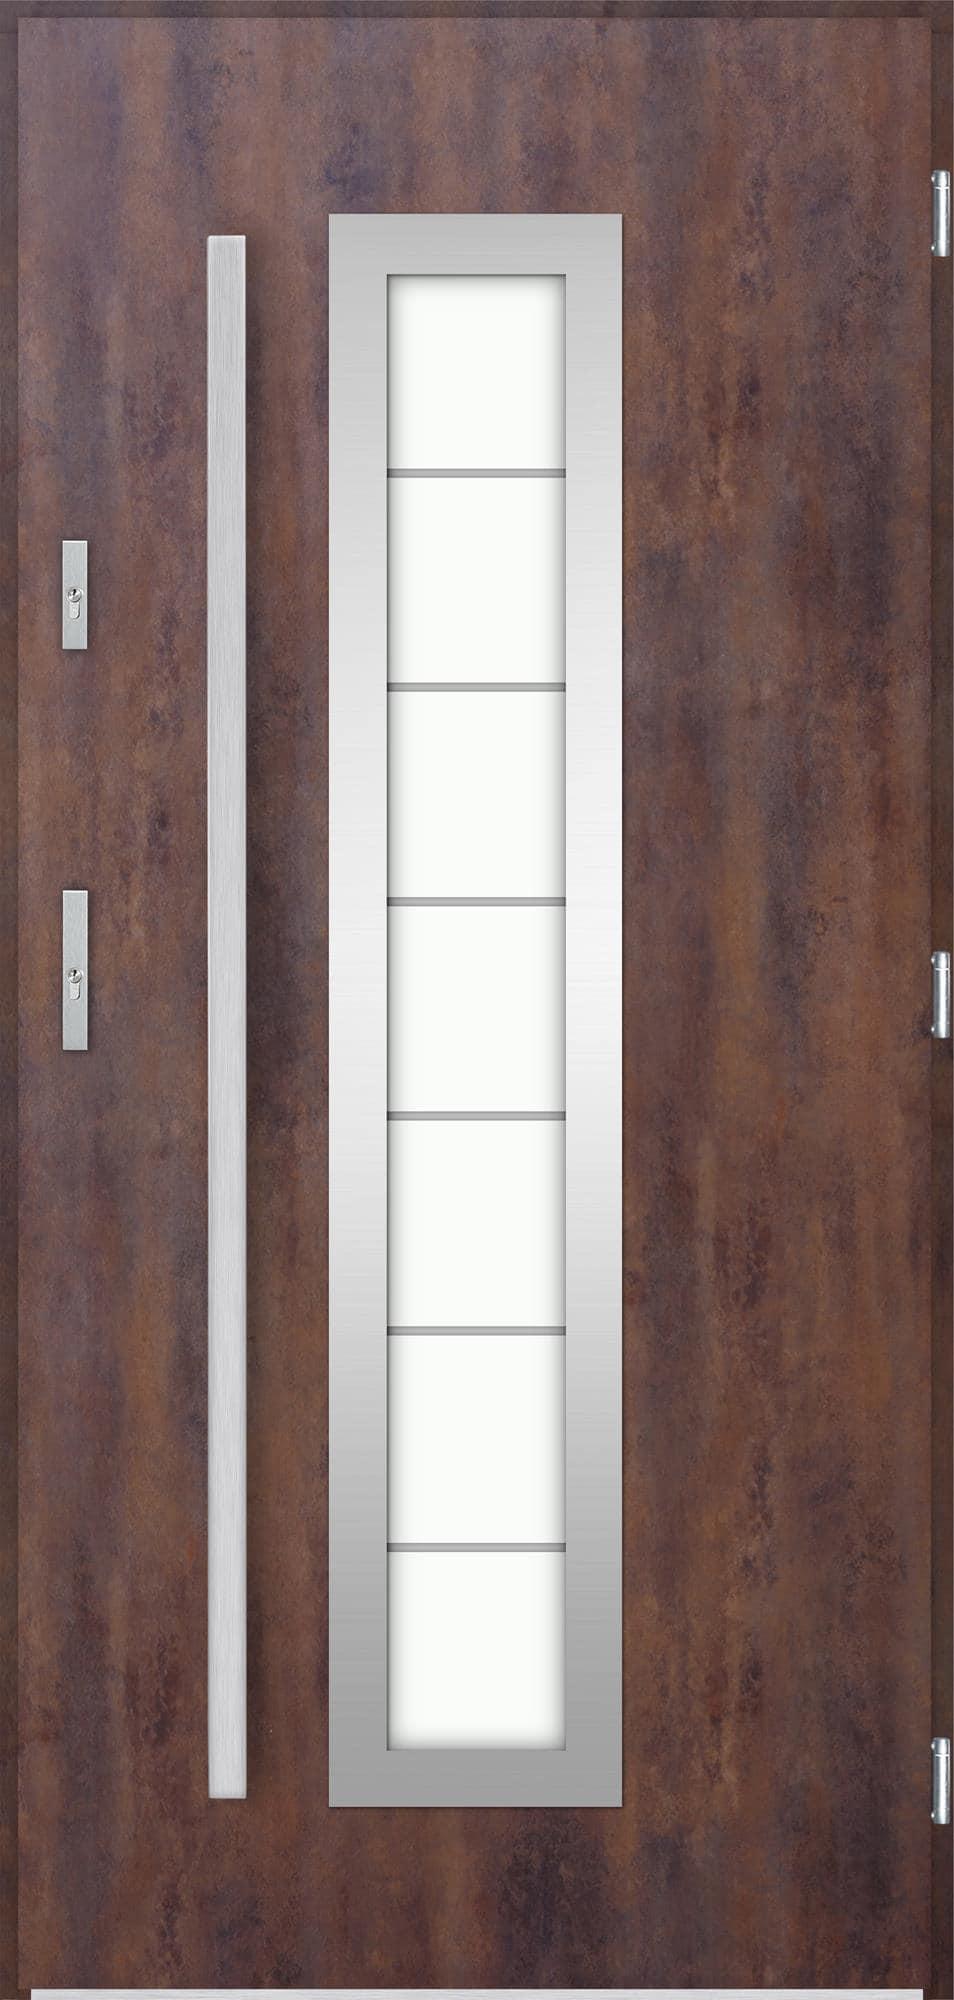 Venkovní vchodové dveøe Hevelio, rez